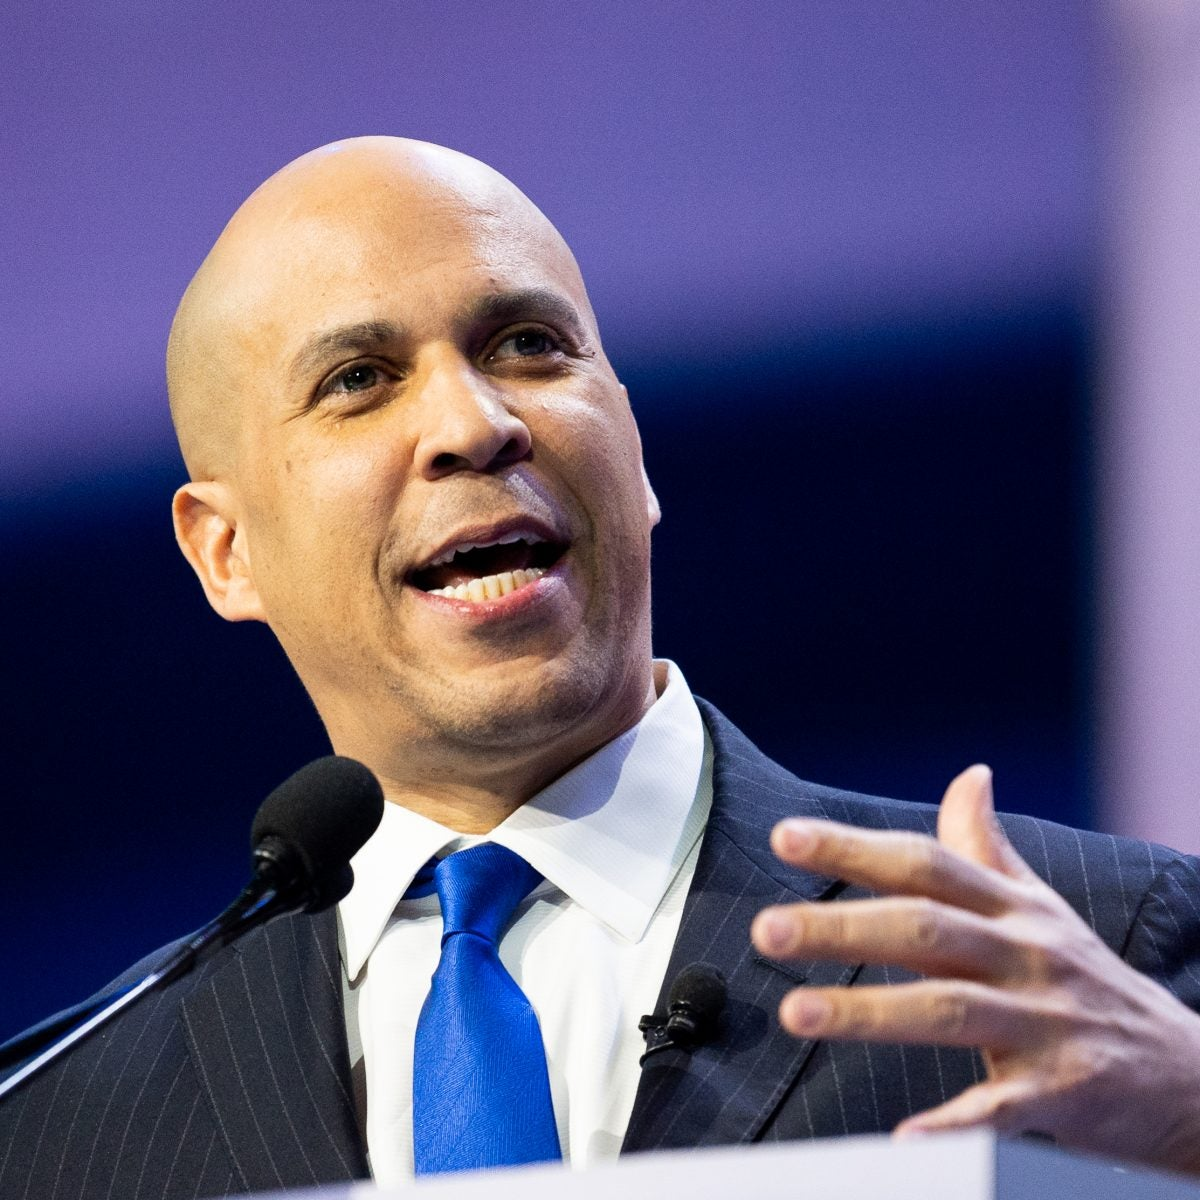 Senator Cory Booker Endorses Joe Biden For President